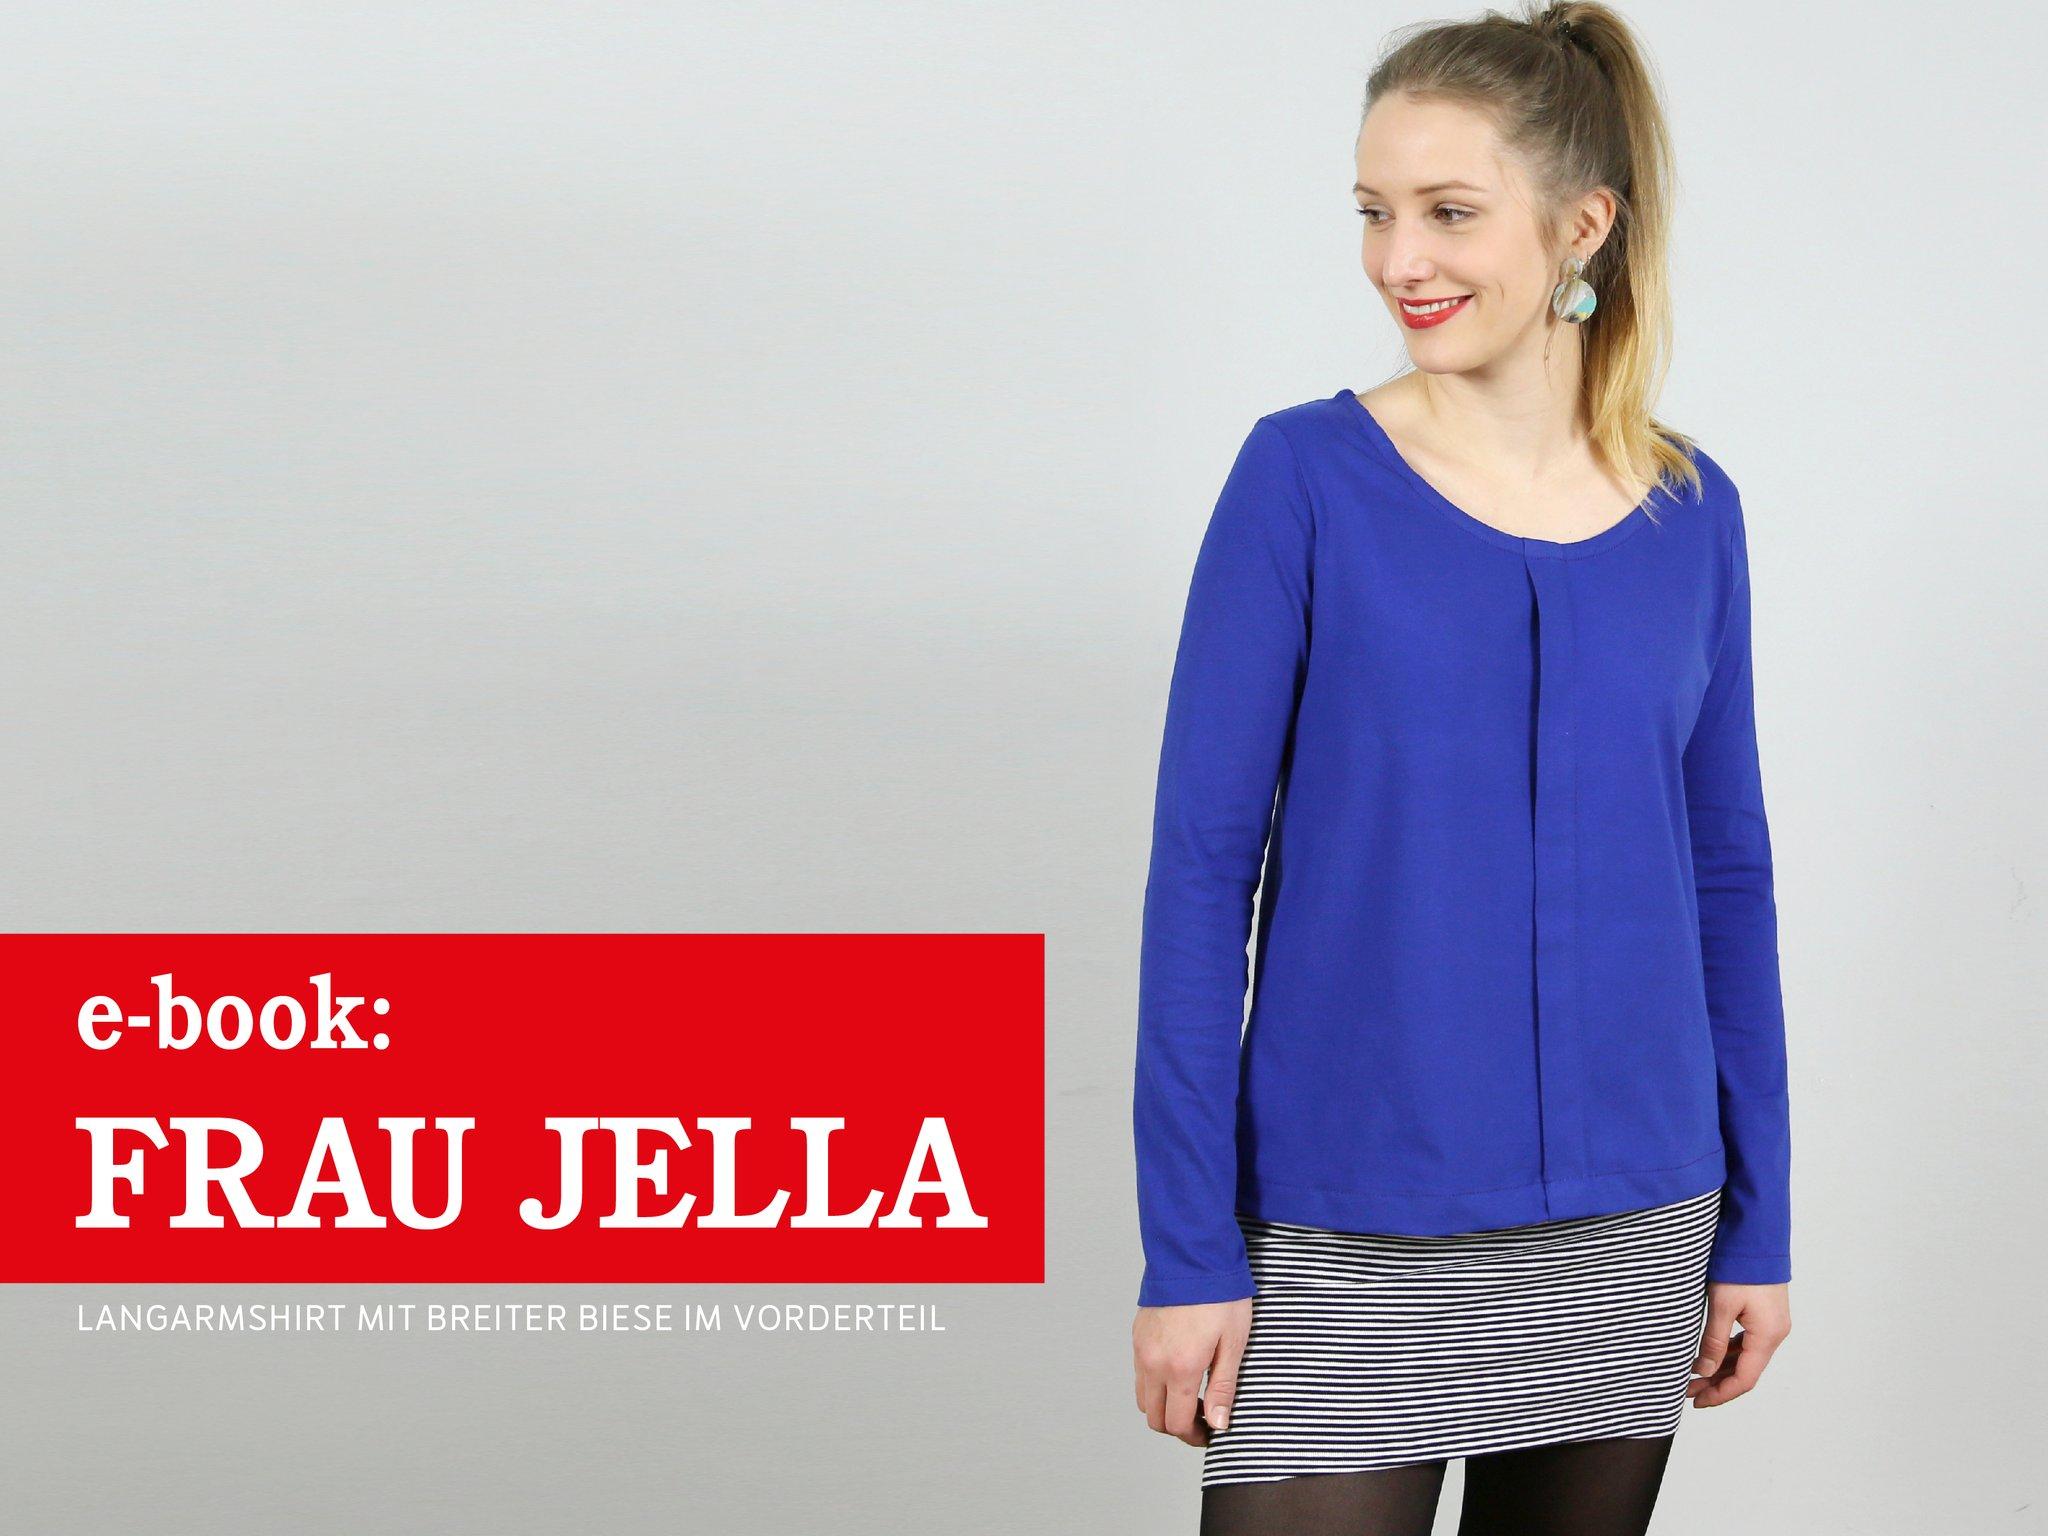 FRAU JELLA • Langarmshirt mit breiter Biese, e-book